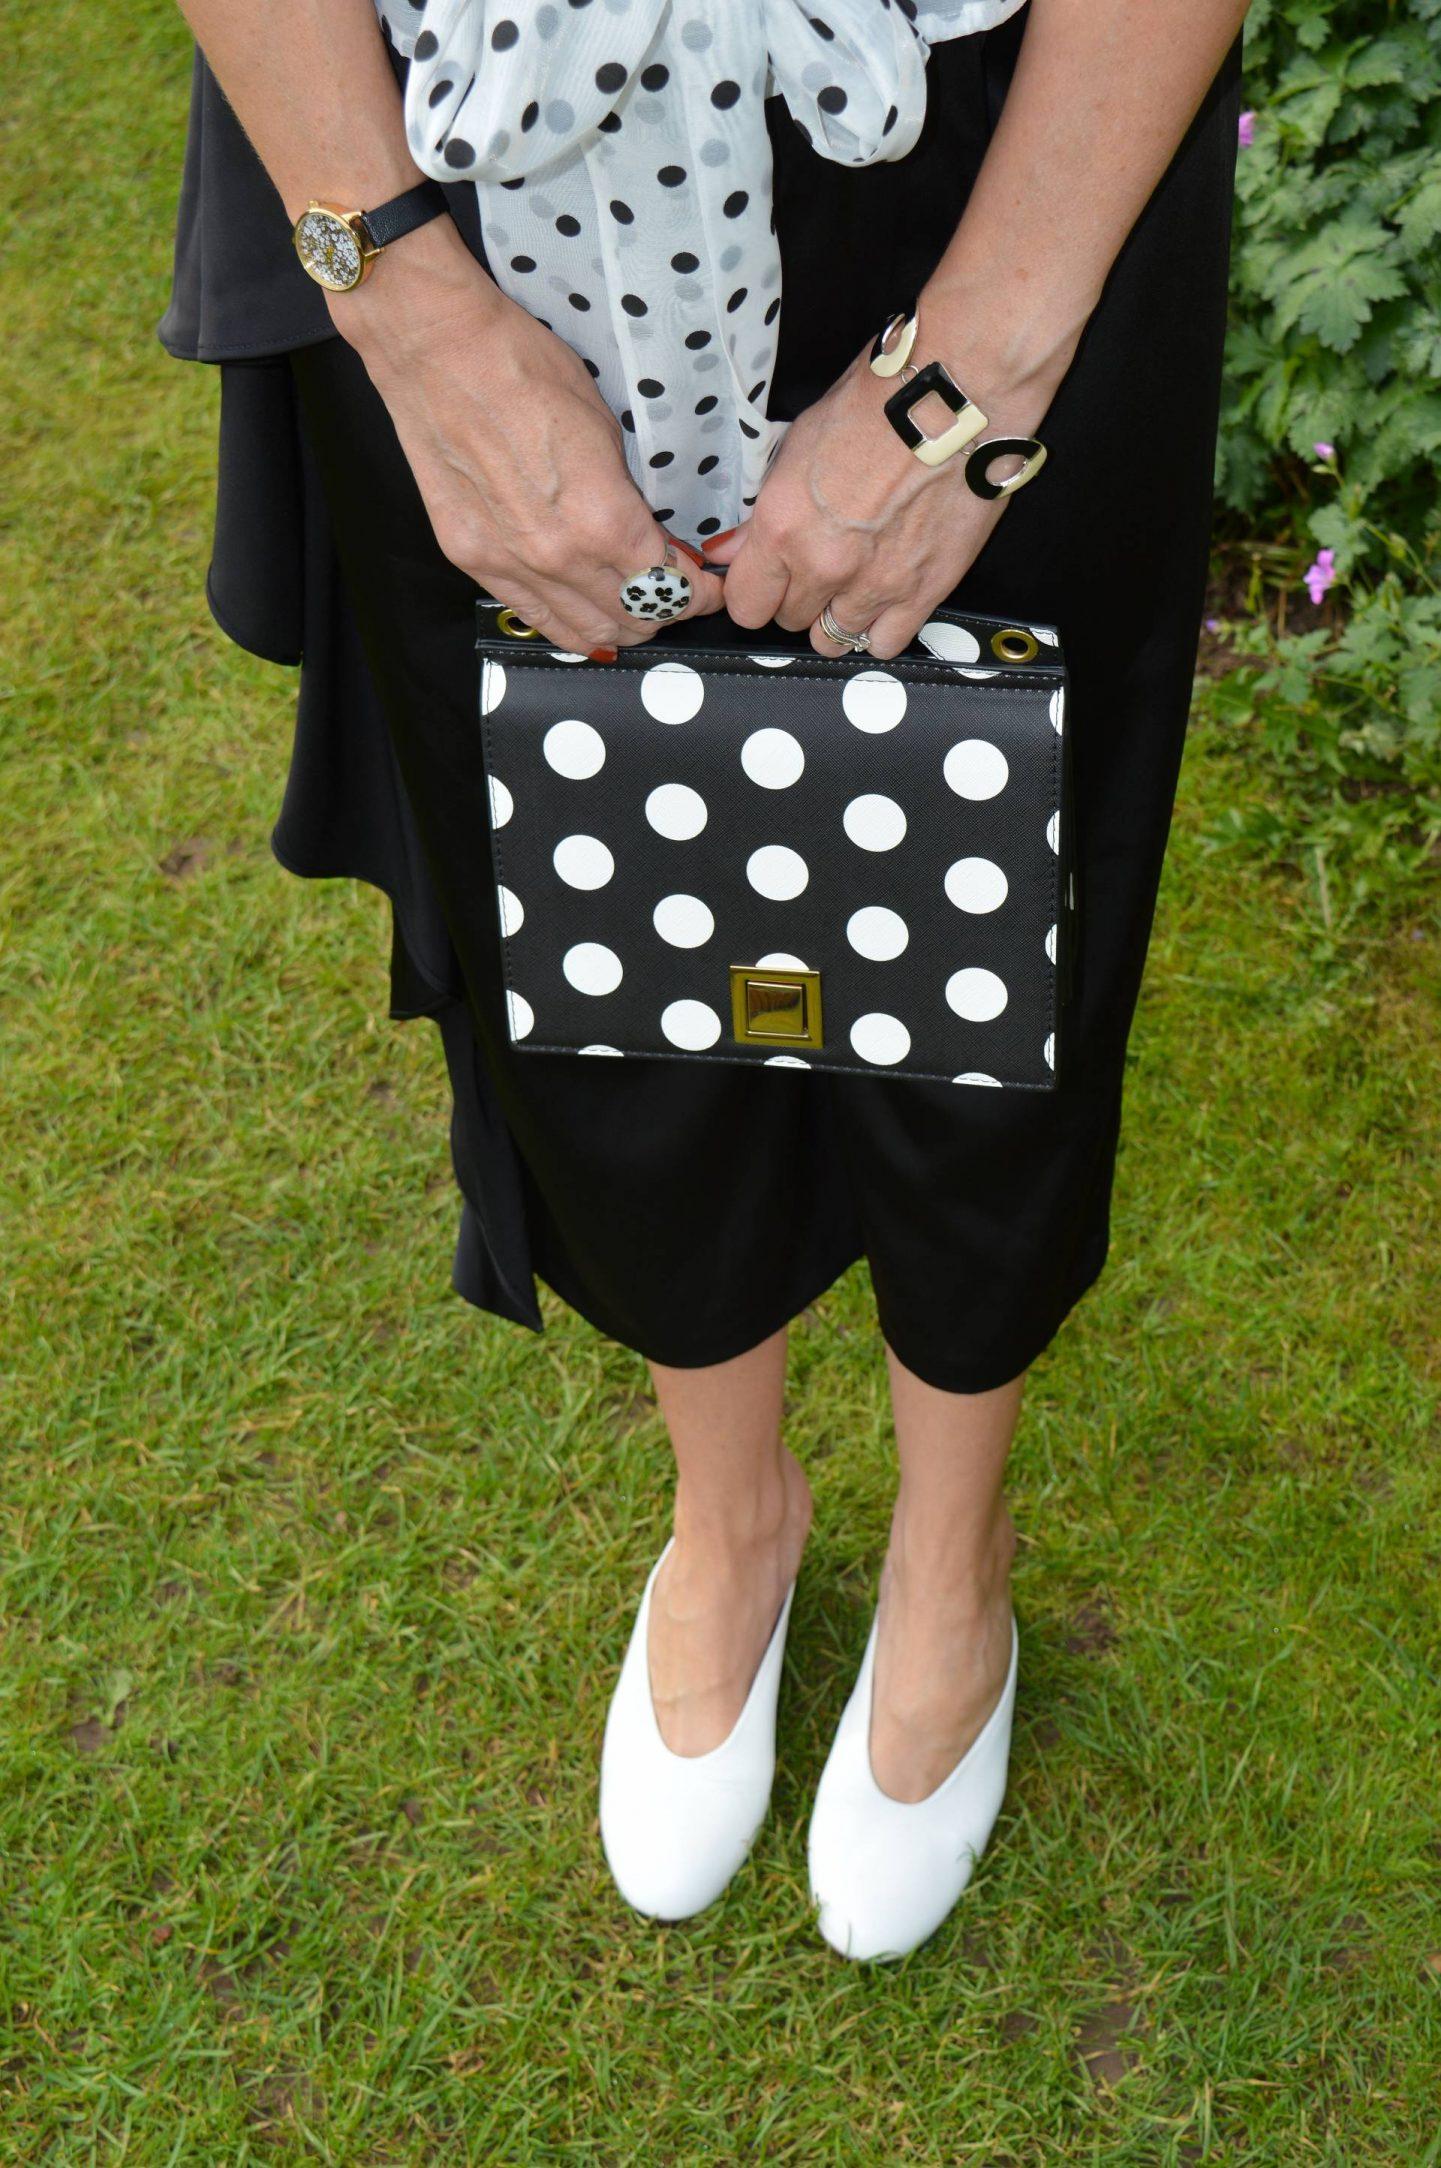 Mango polka dot bag, white preloved shoes